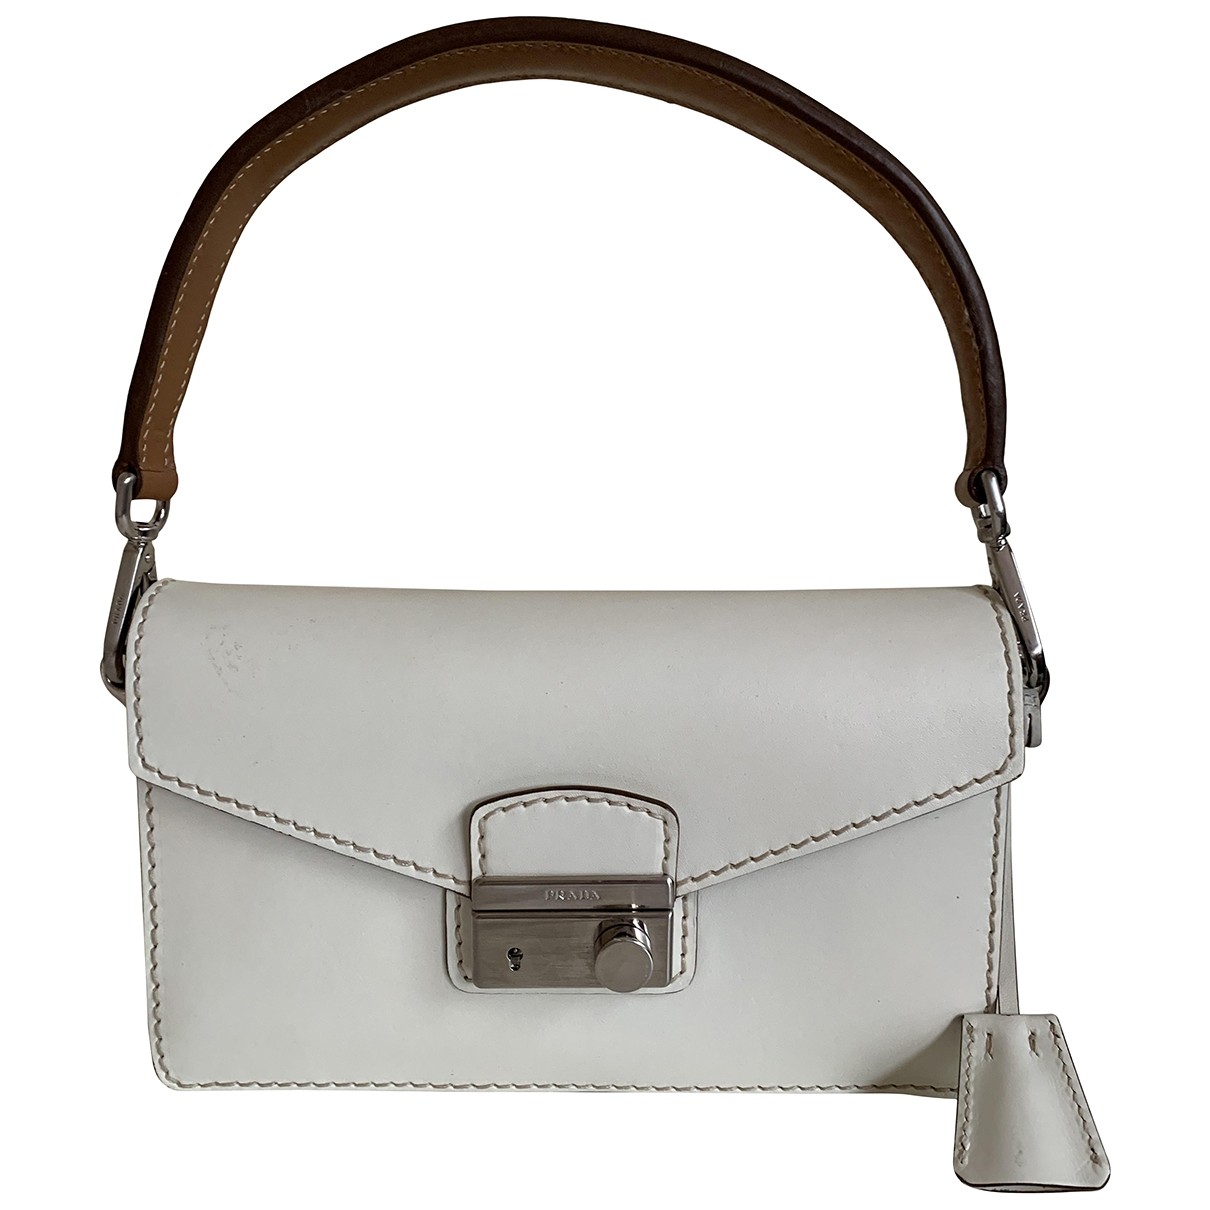 Prada \N Handtasche in  Ecru Leder